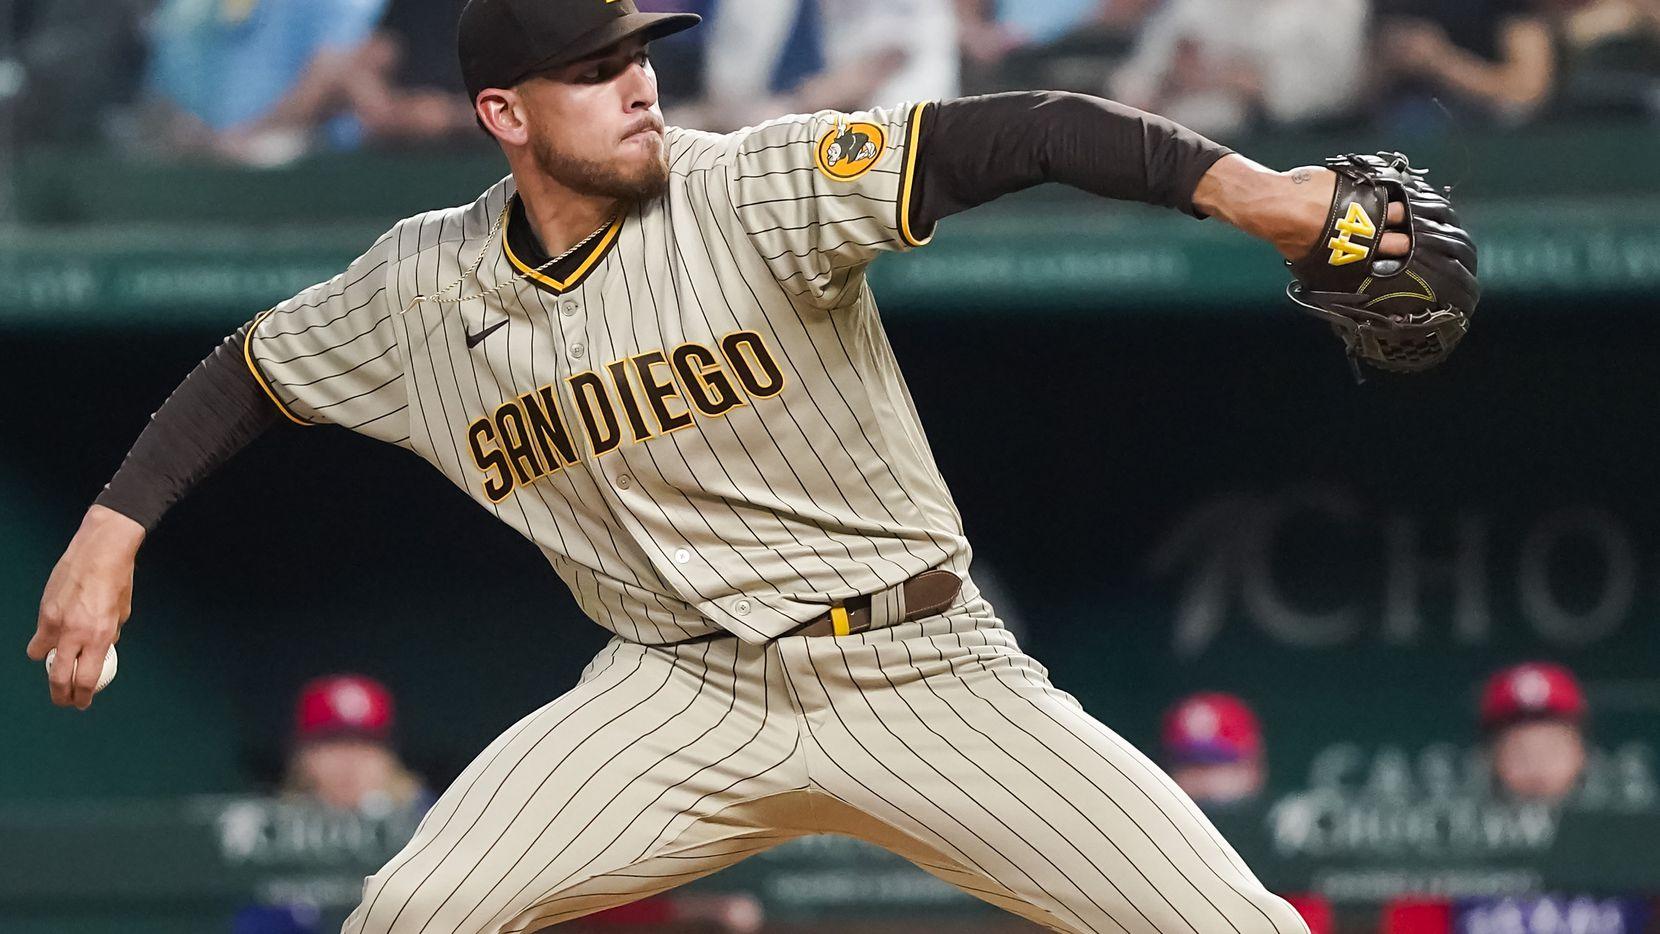 EL pitcher de los Padres de San Diego, Joe Musgrove, pasó a la historia en el Globe Life Field de Arlington.